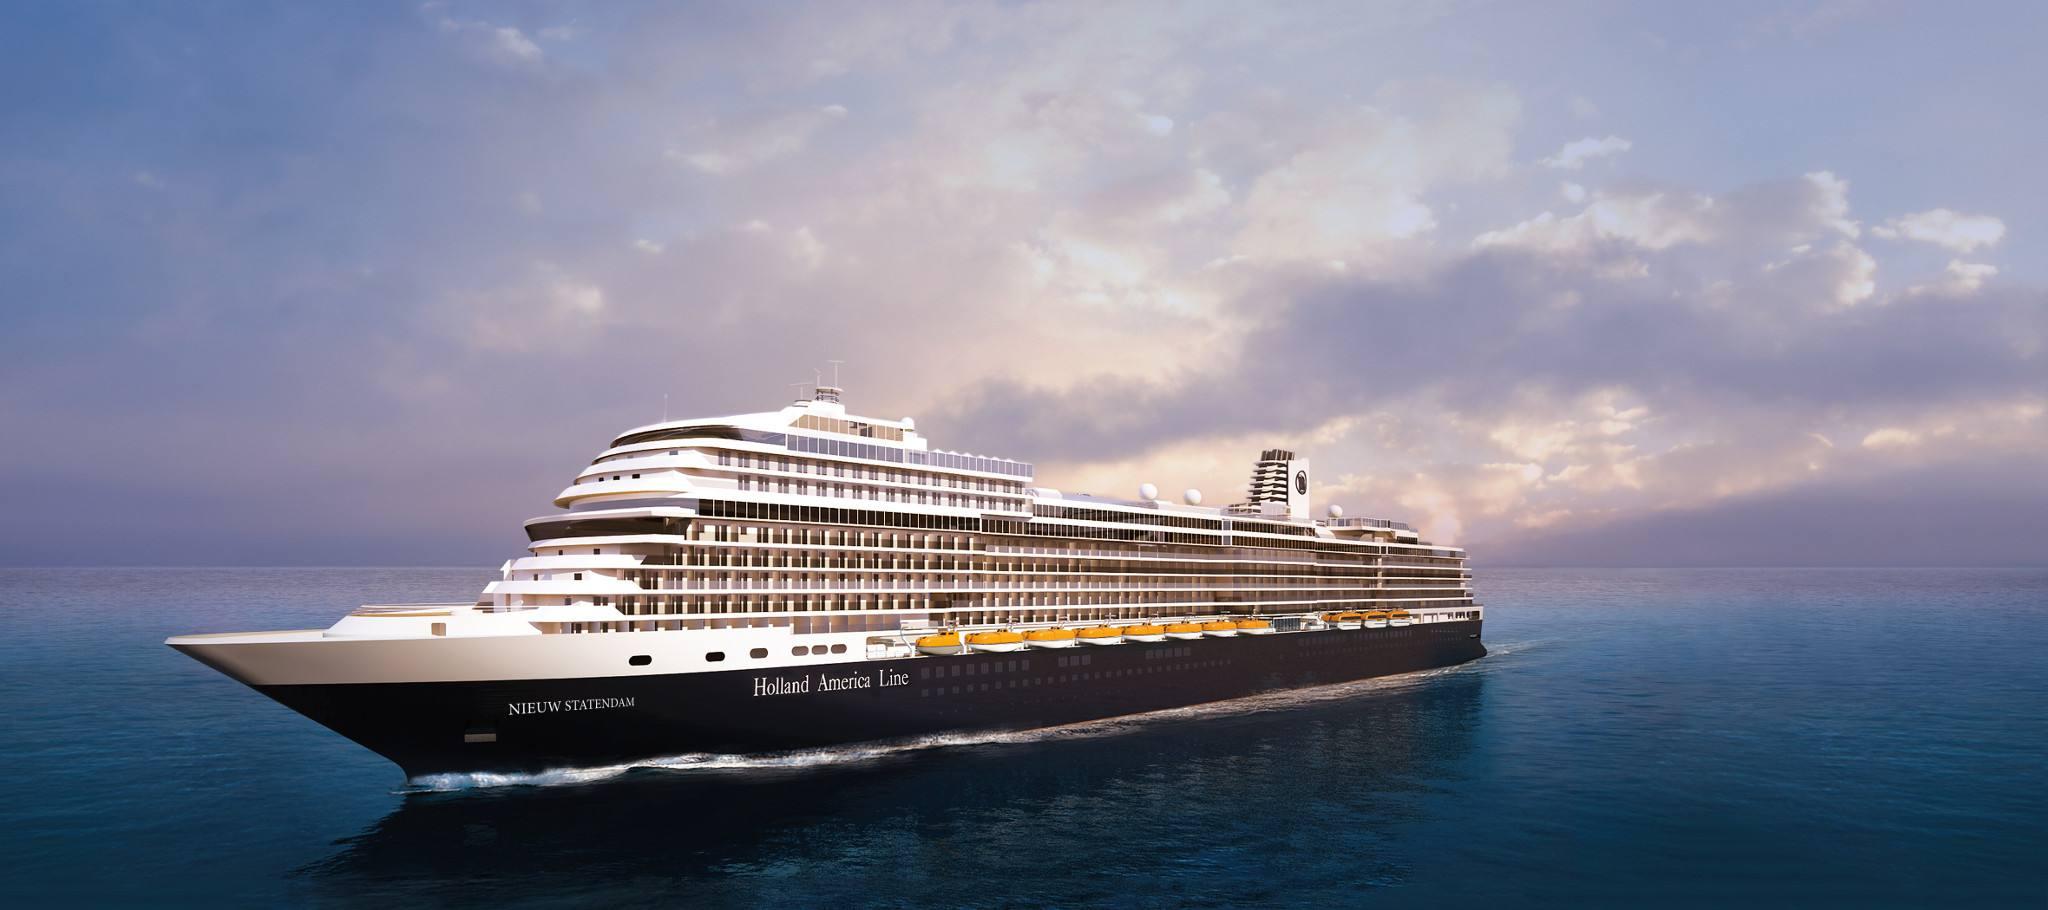 Nieuw Statendam cruise ship of Holland America Line